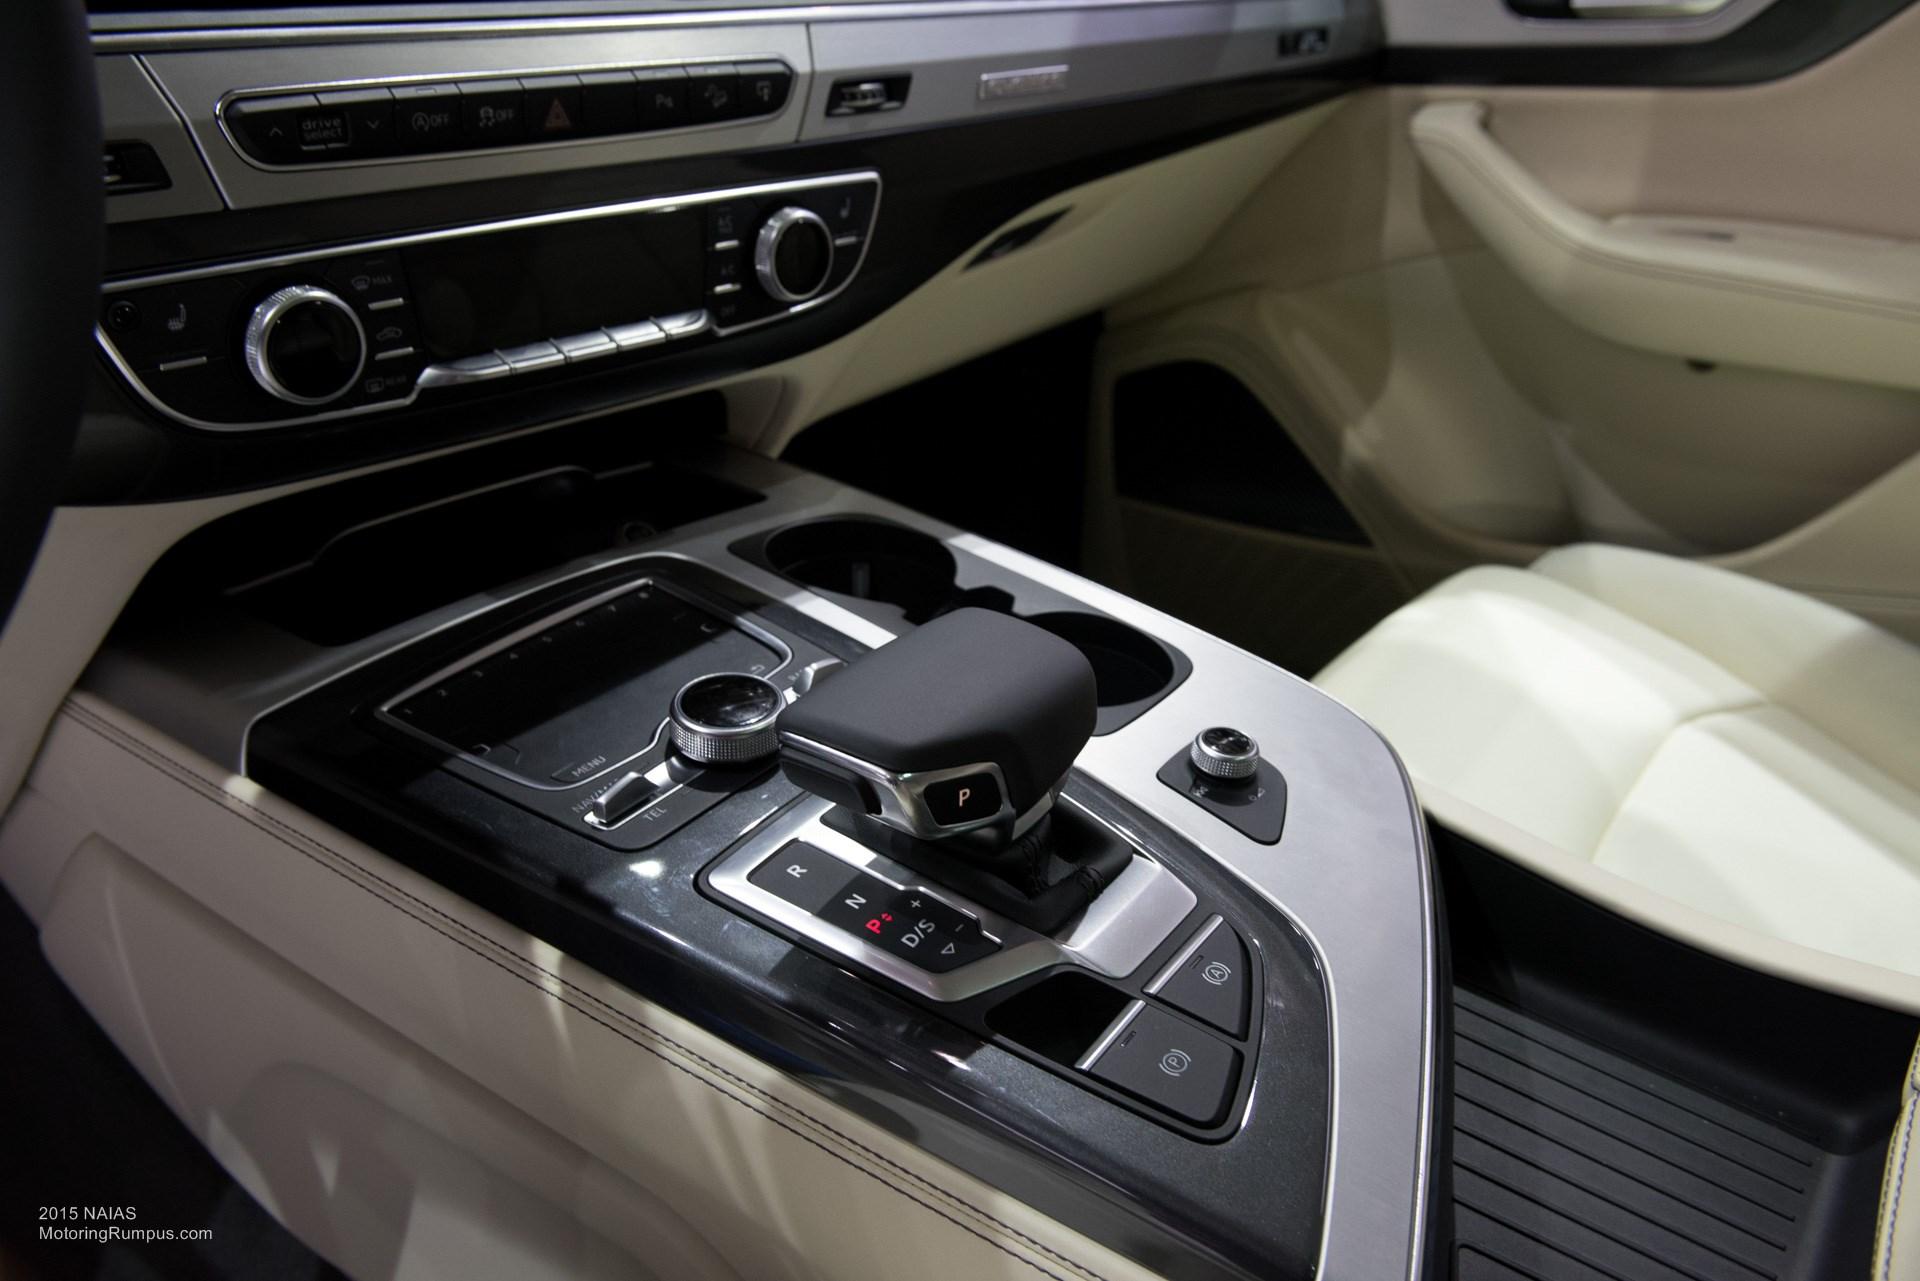 2015 NAIAS Audi Q7 Center Console